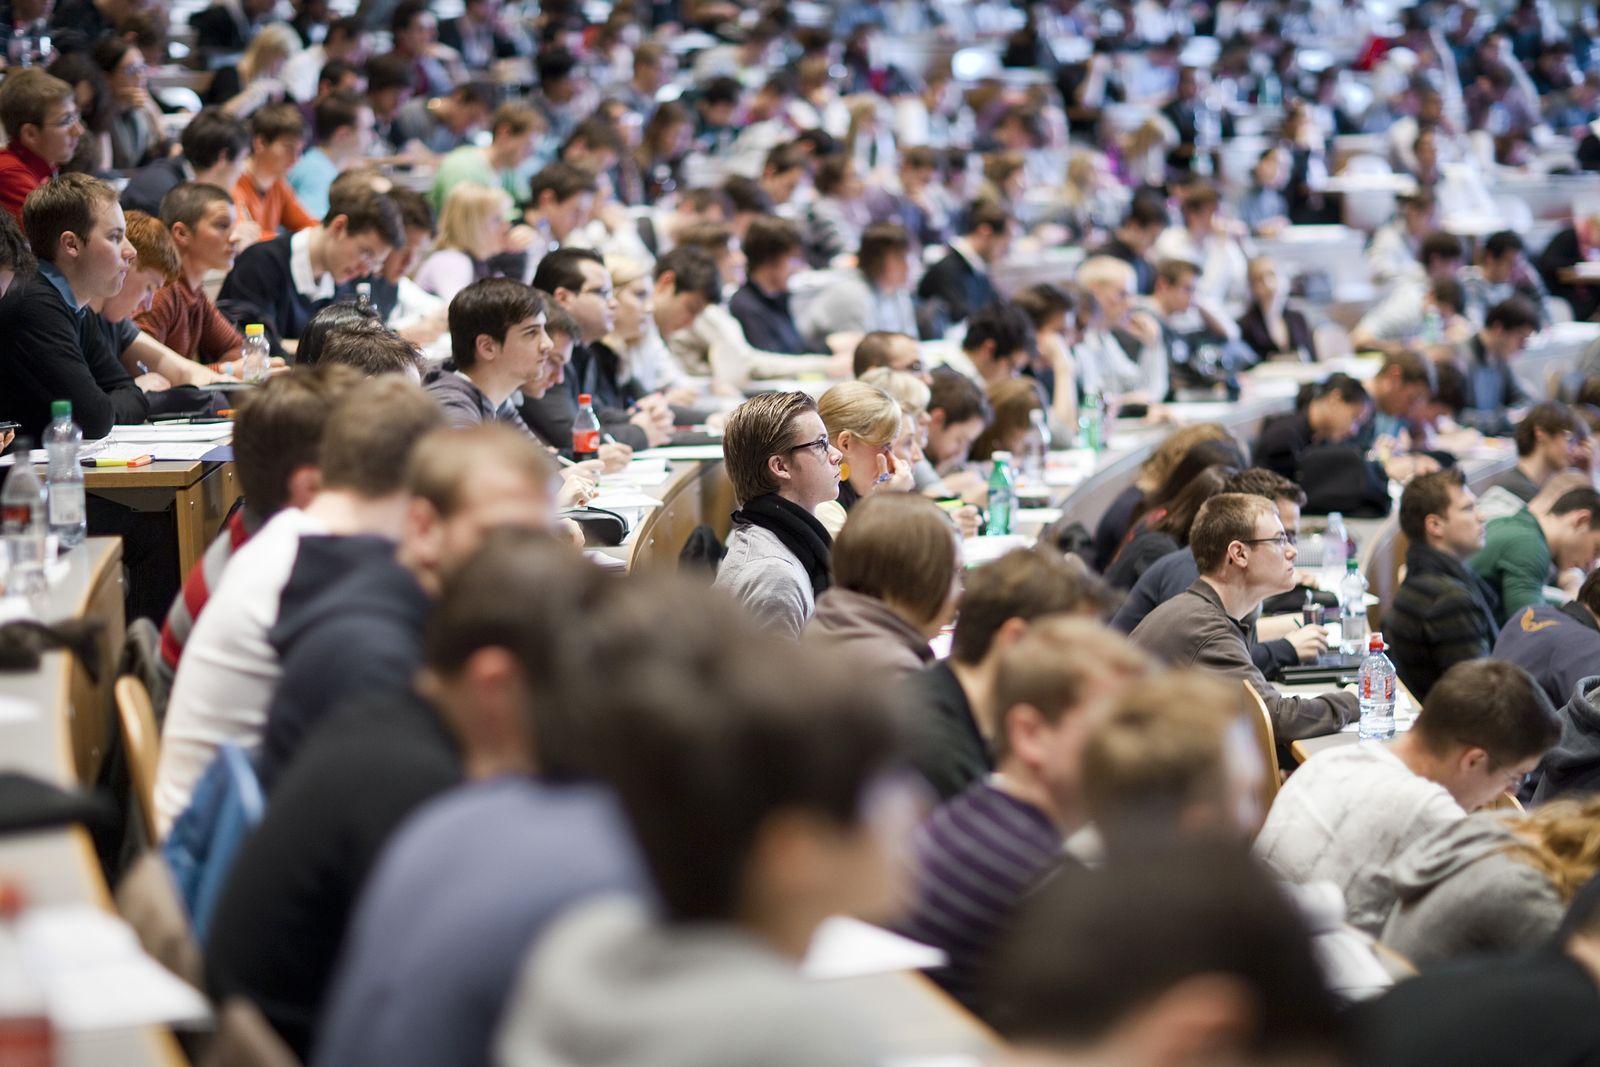 Studenten / Uni St. Gallen/ Schweiz